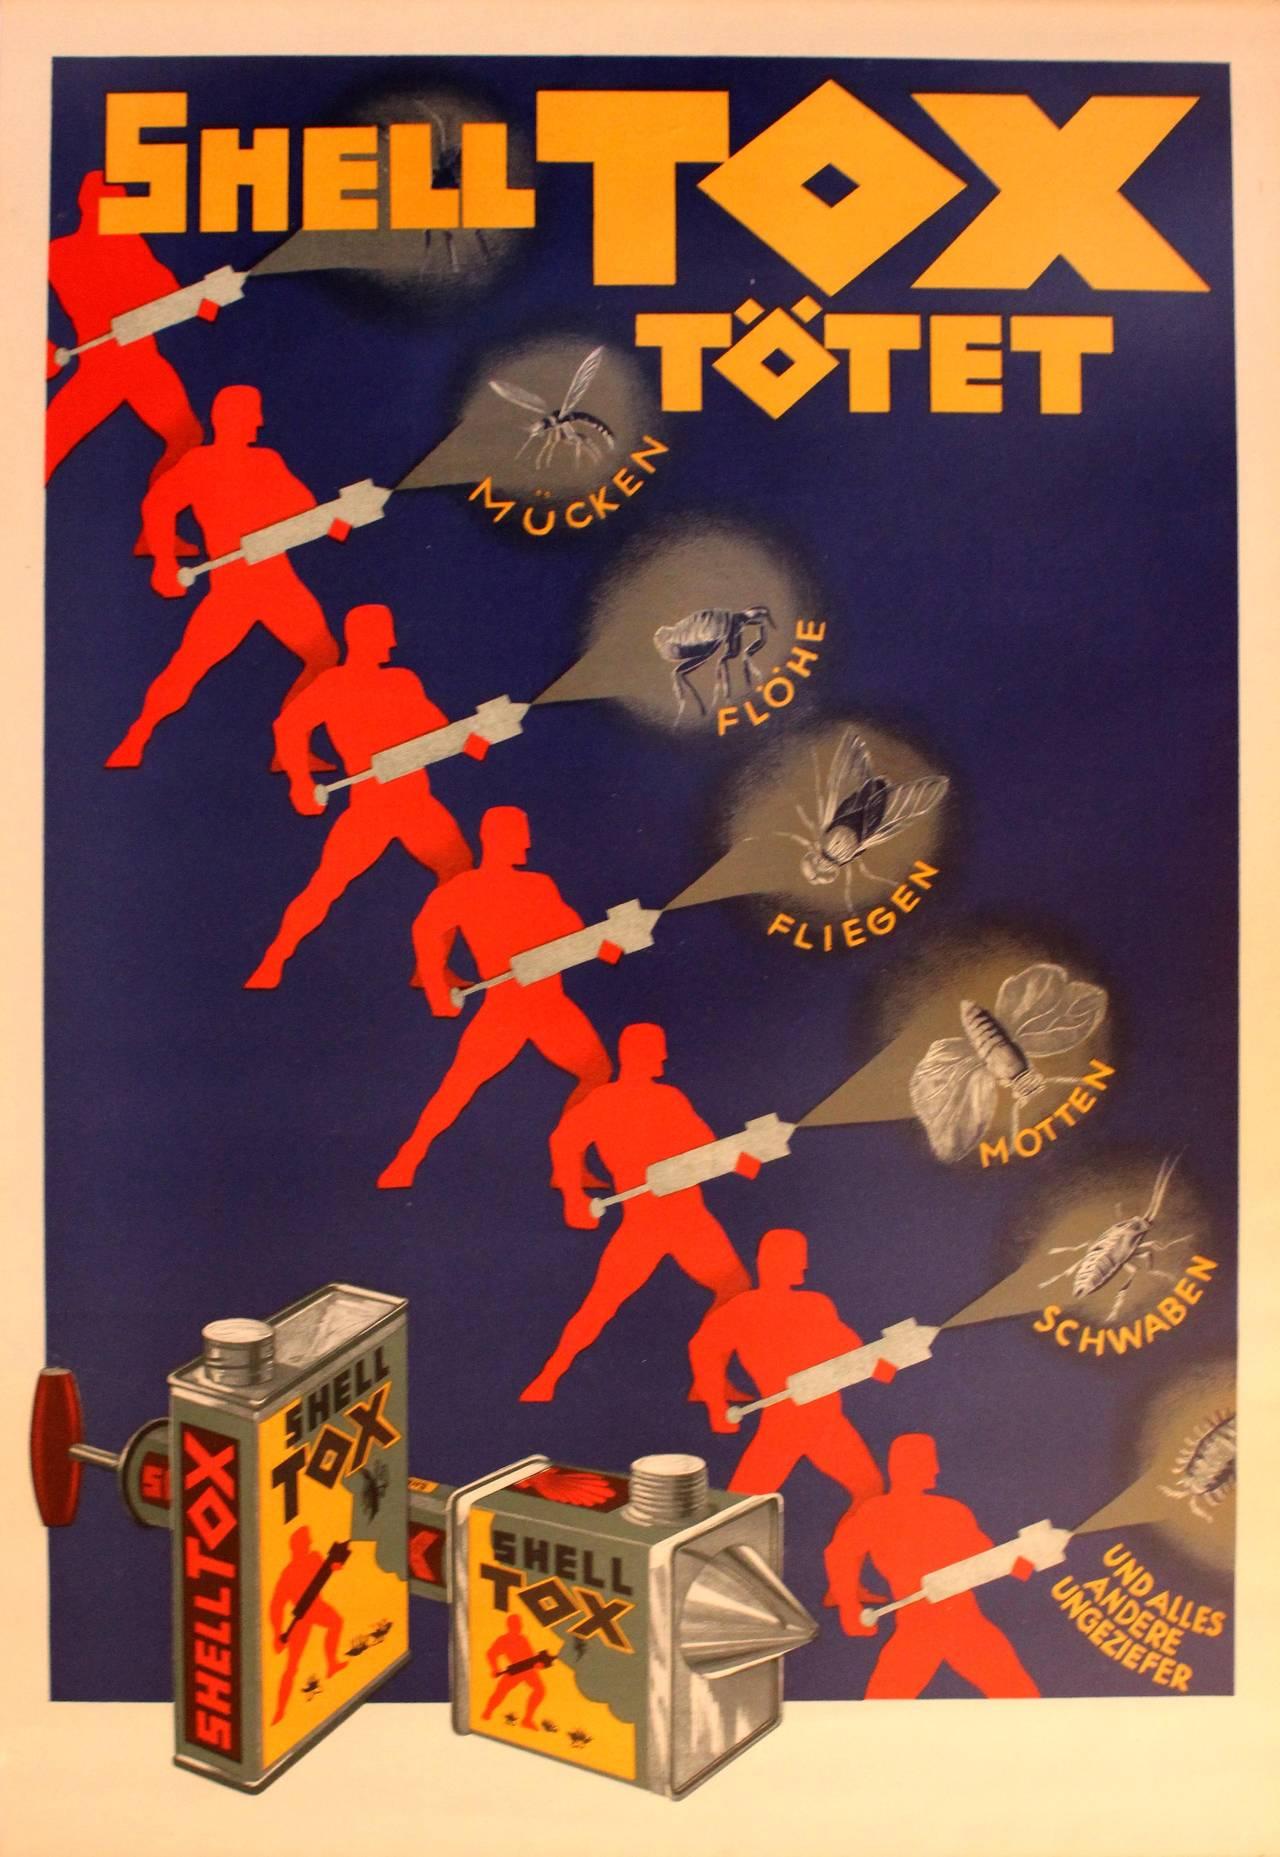 Original Vintage S Art Deco Advertising Poster For